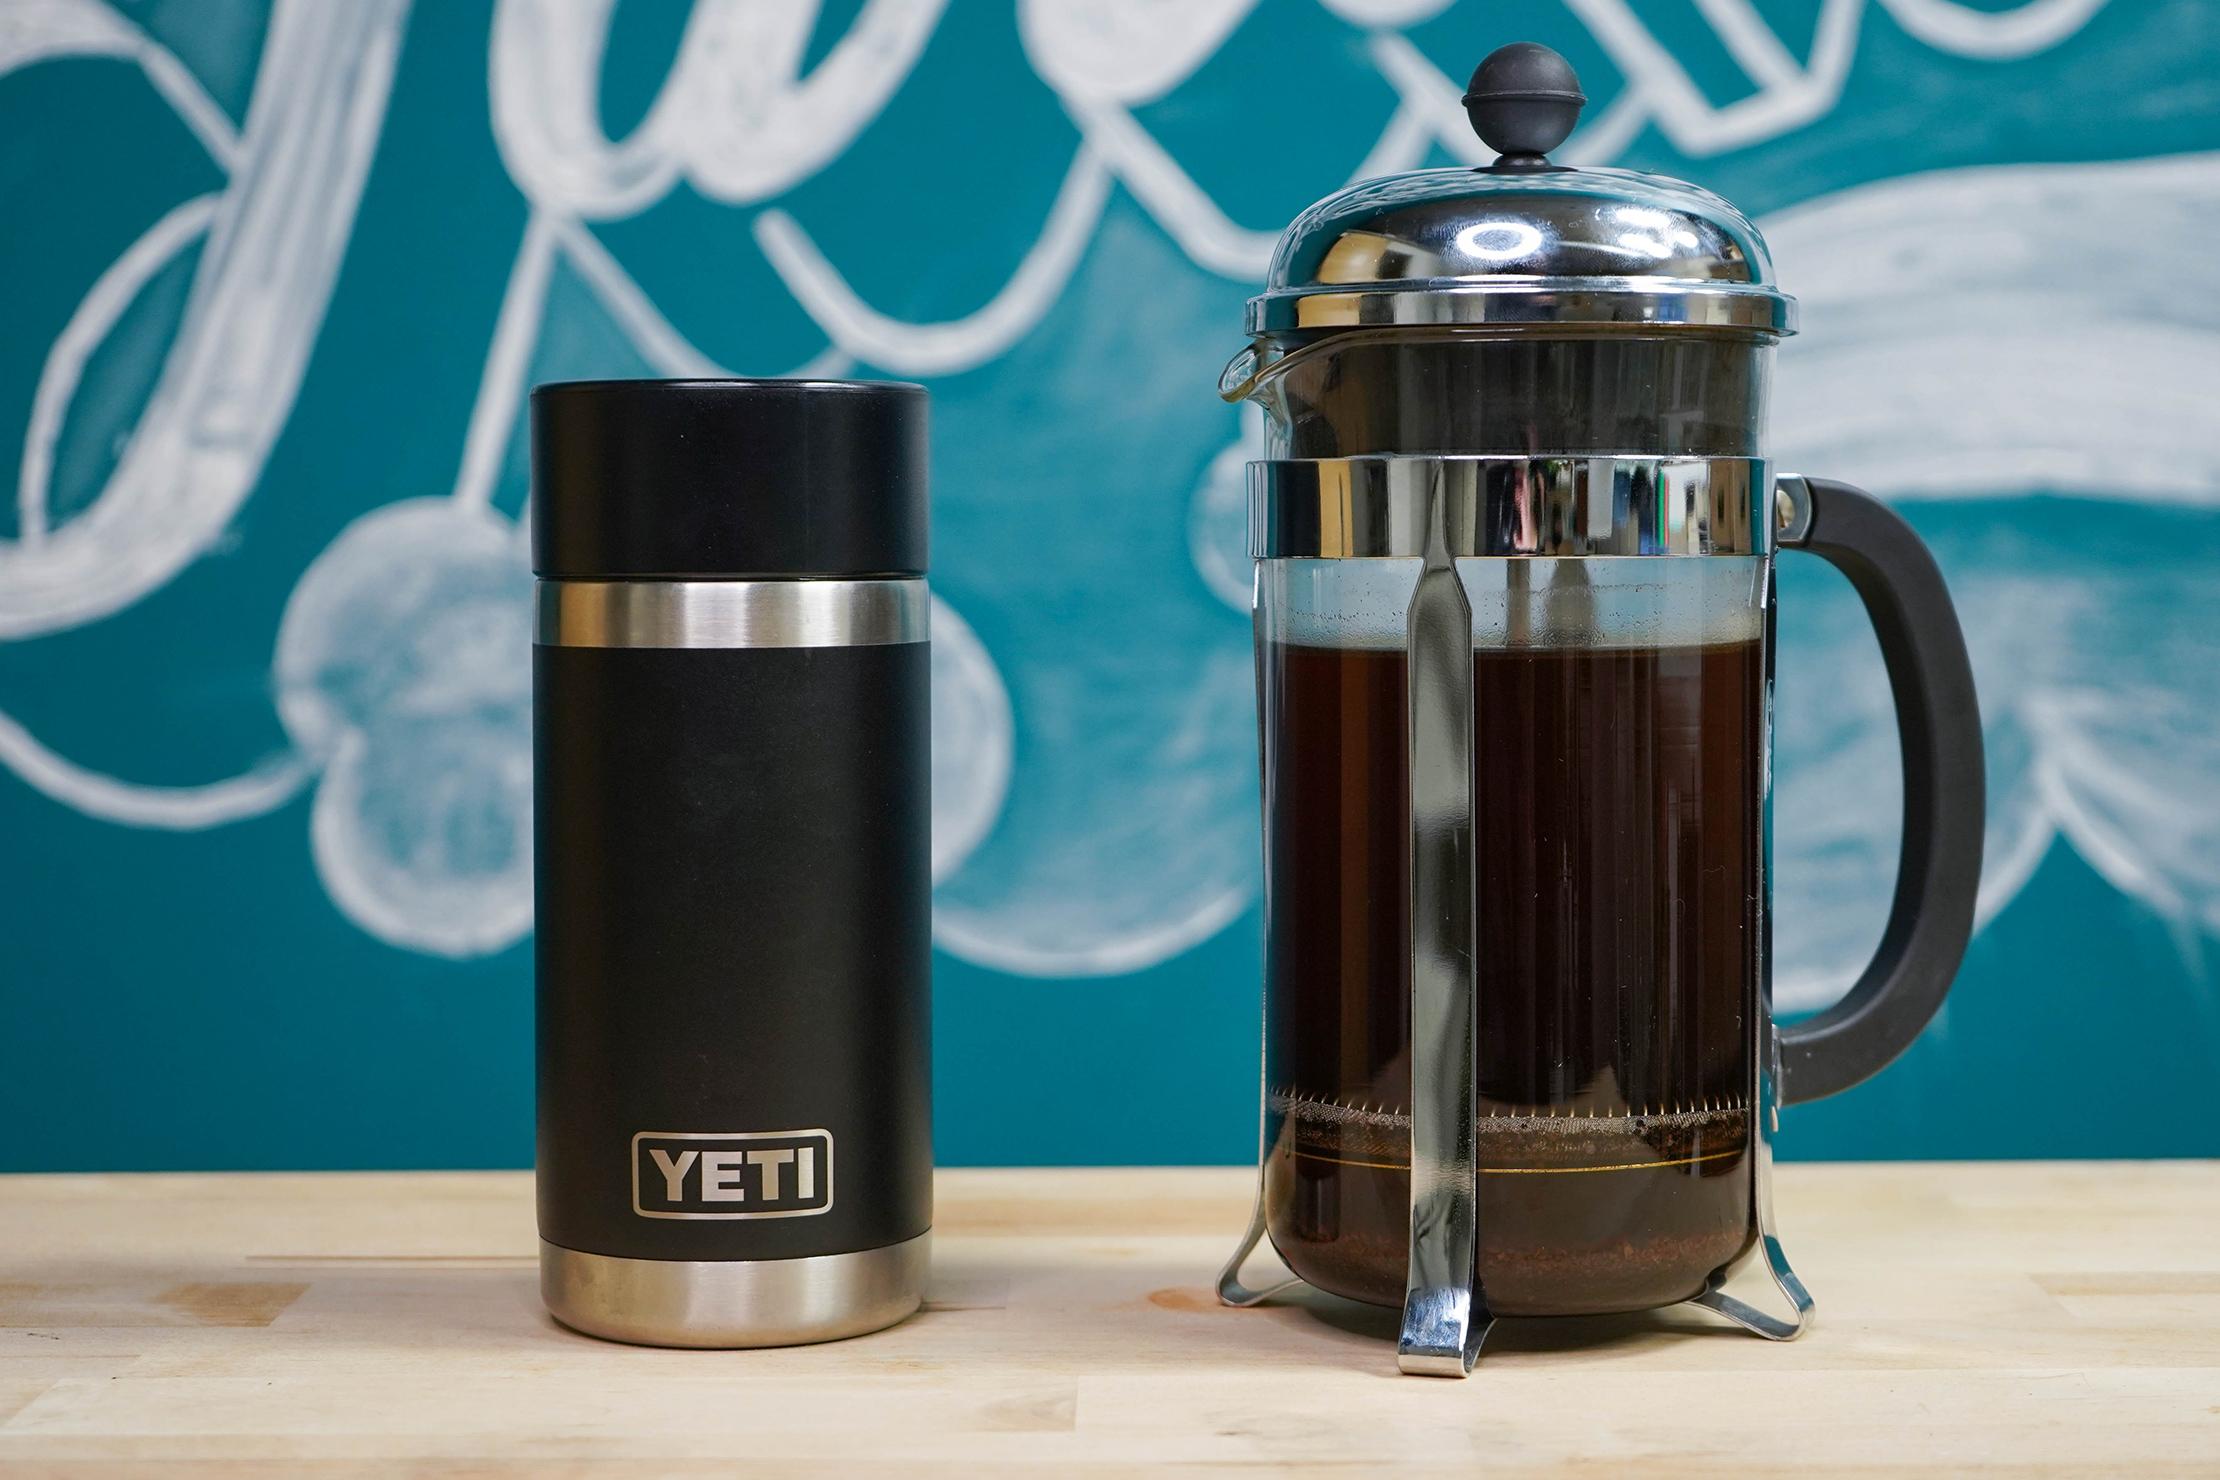 Yeti Rambler 12oz Bottle With HotShot Cap Next To French Press